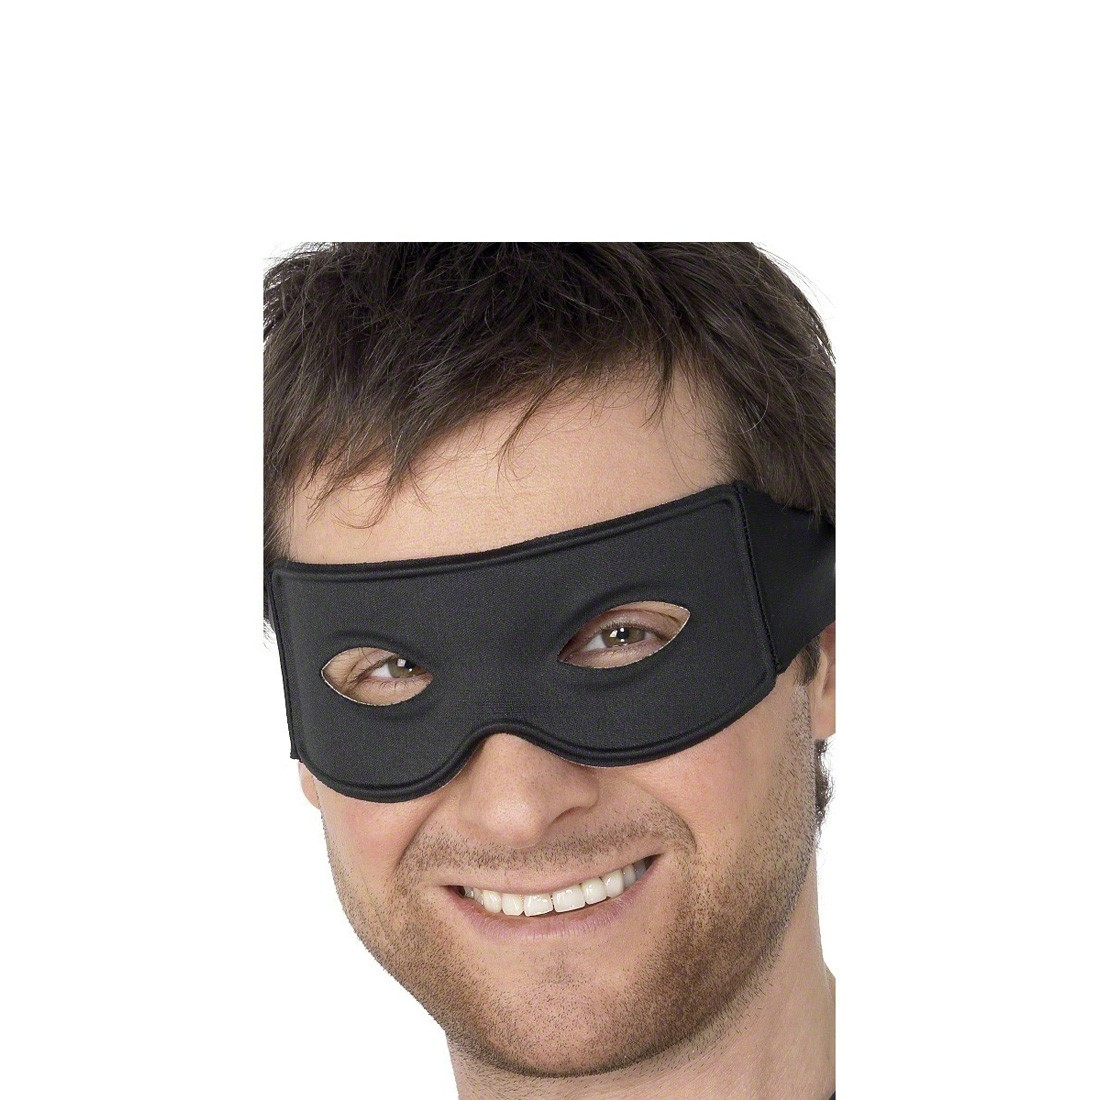 zorro maske schwarz banditenmaske zorromaske augenmaske kost mmaske 4 99. Black Bedroom Furniture Sets. Home Design Ideas